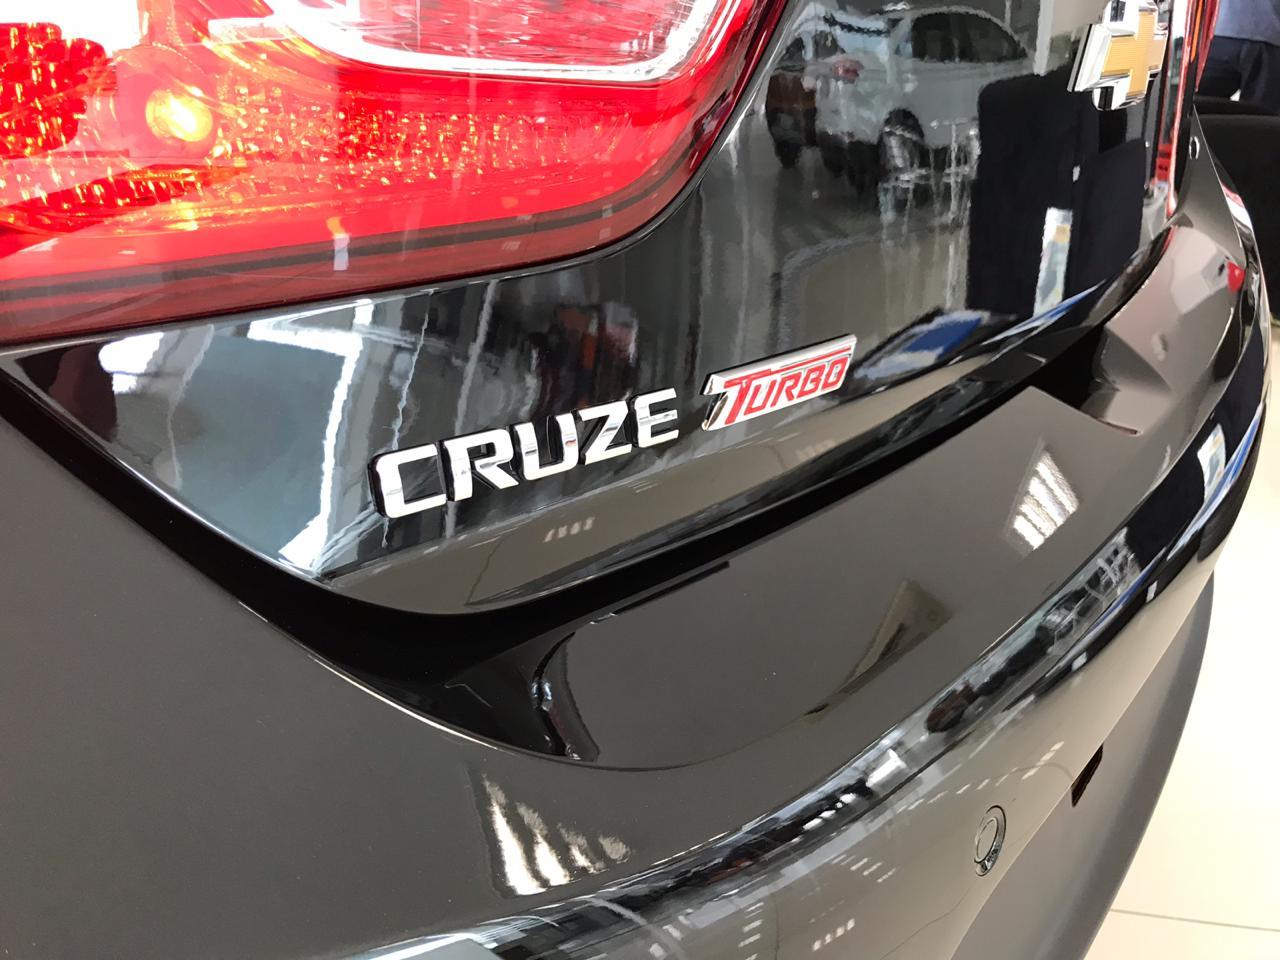 CHEVROLET CRUZE SPORT6 LT 1.4 TURBO 2019